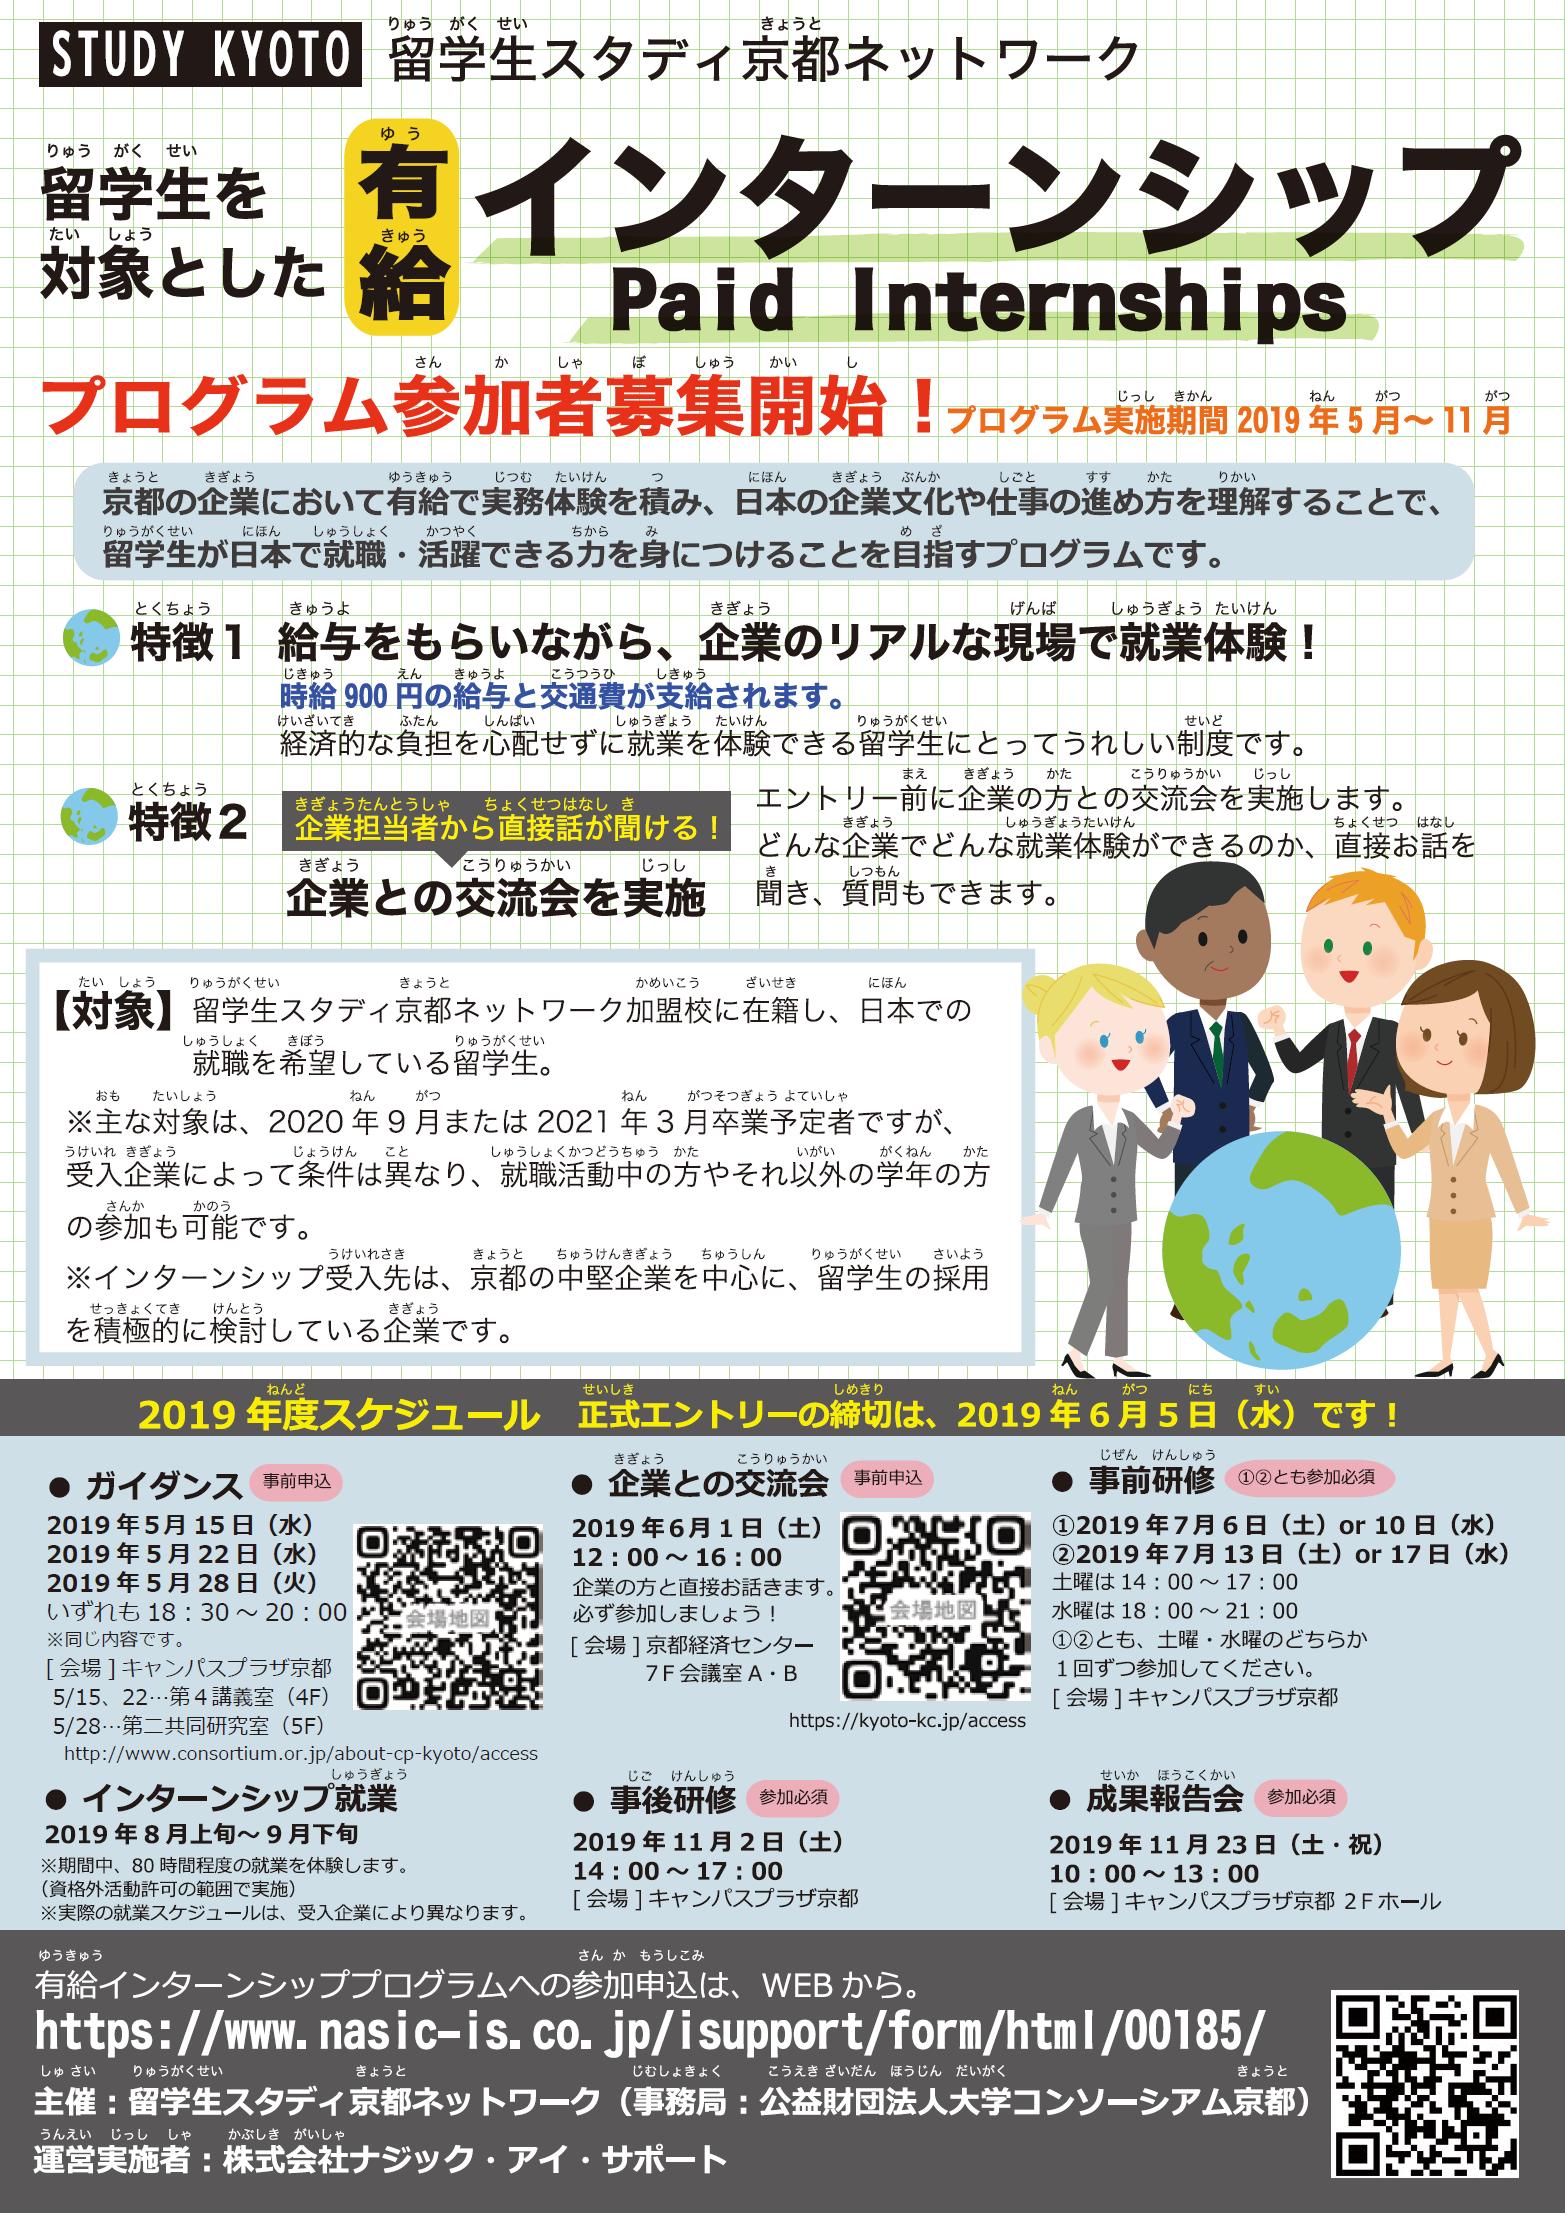 2019STUDY KYOTO留学生有給インターンシップ募集チラシ(28日追加)